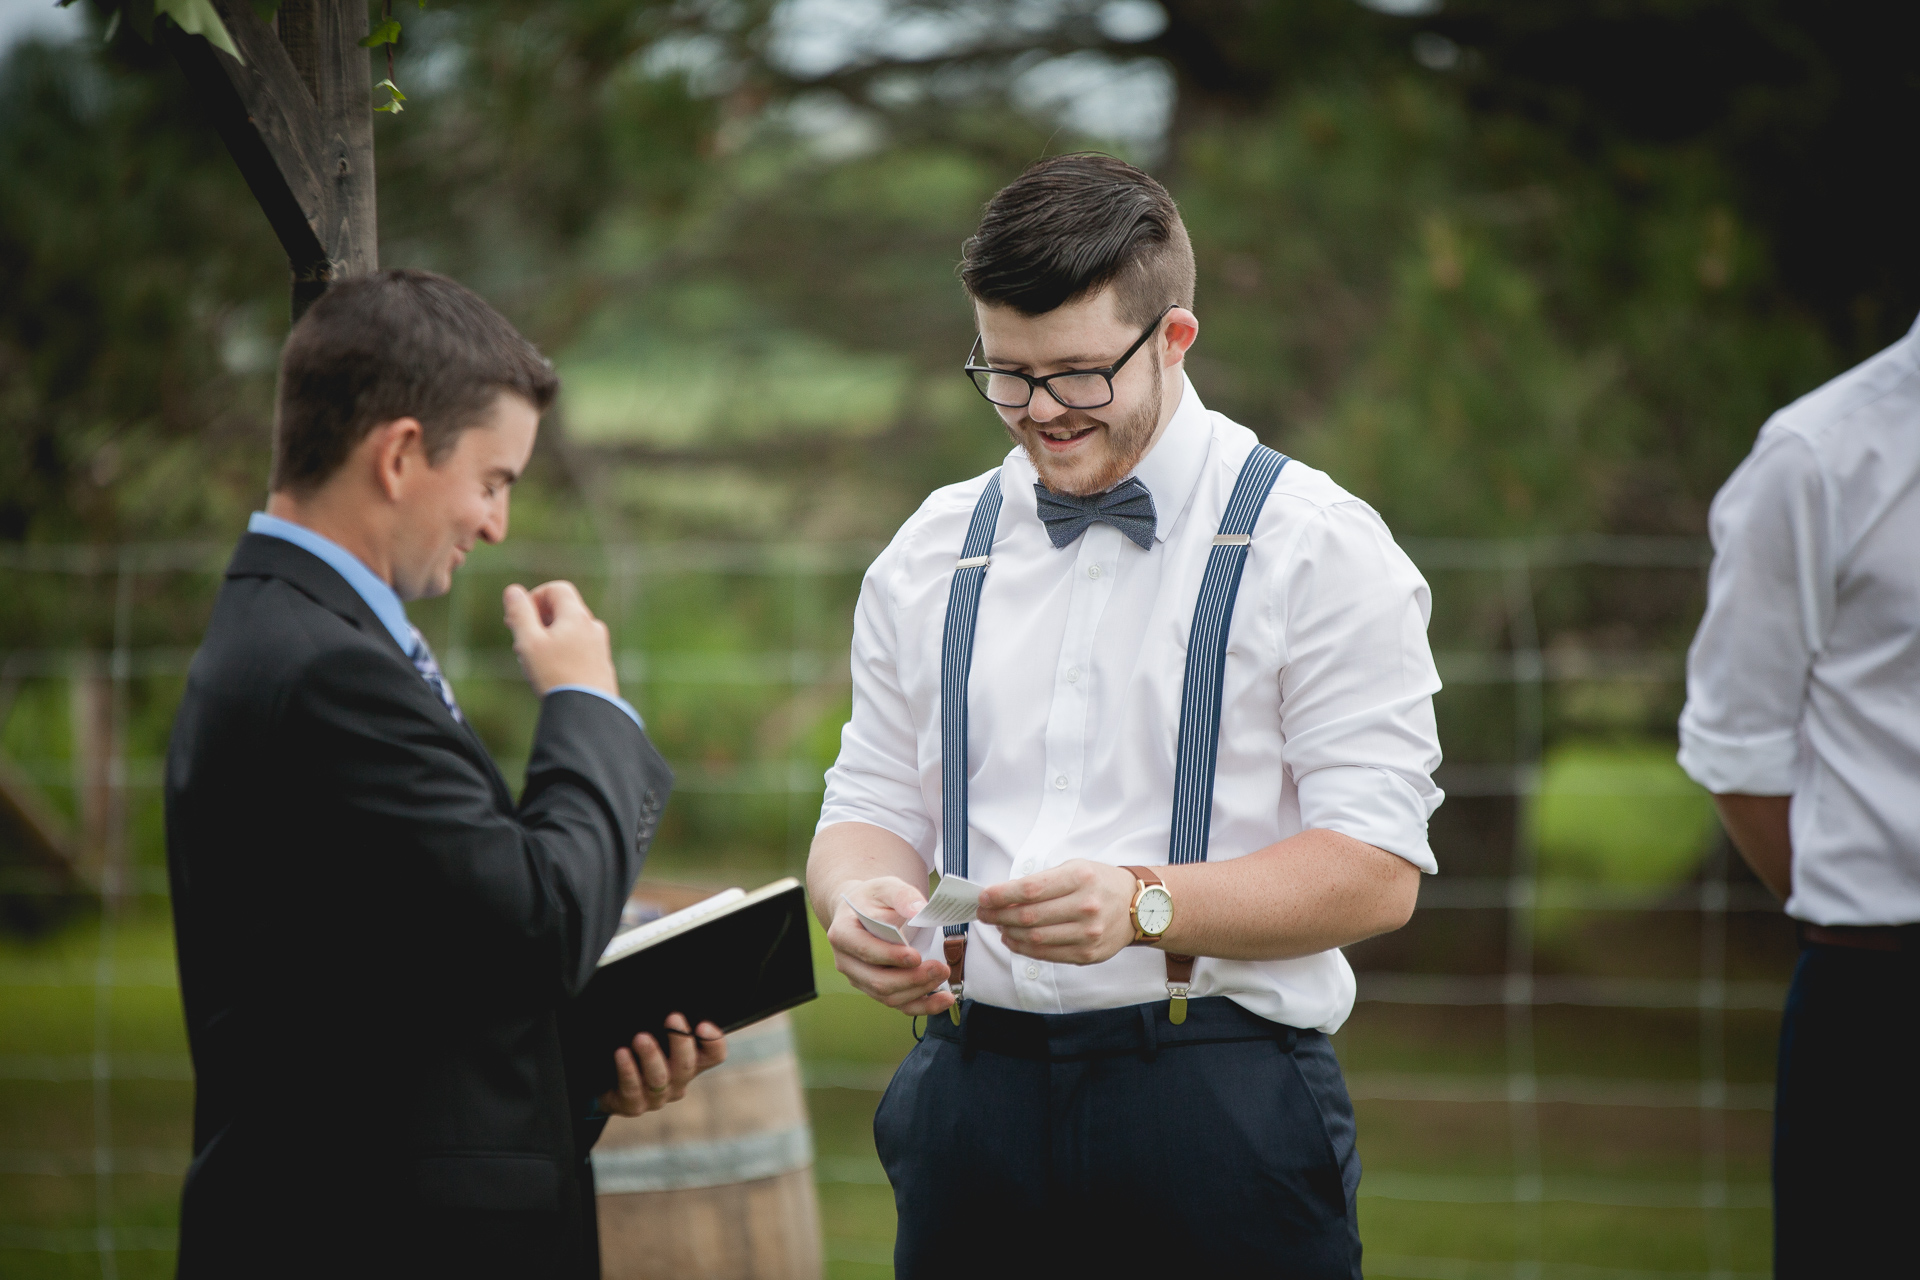 Stayner Wedding Photographer